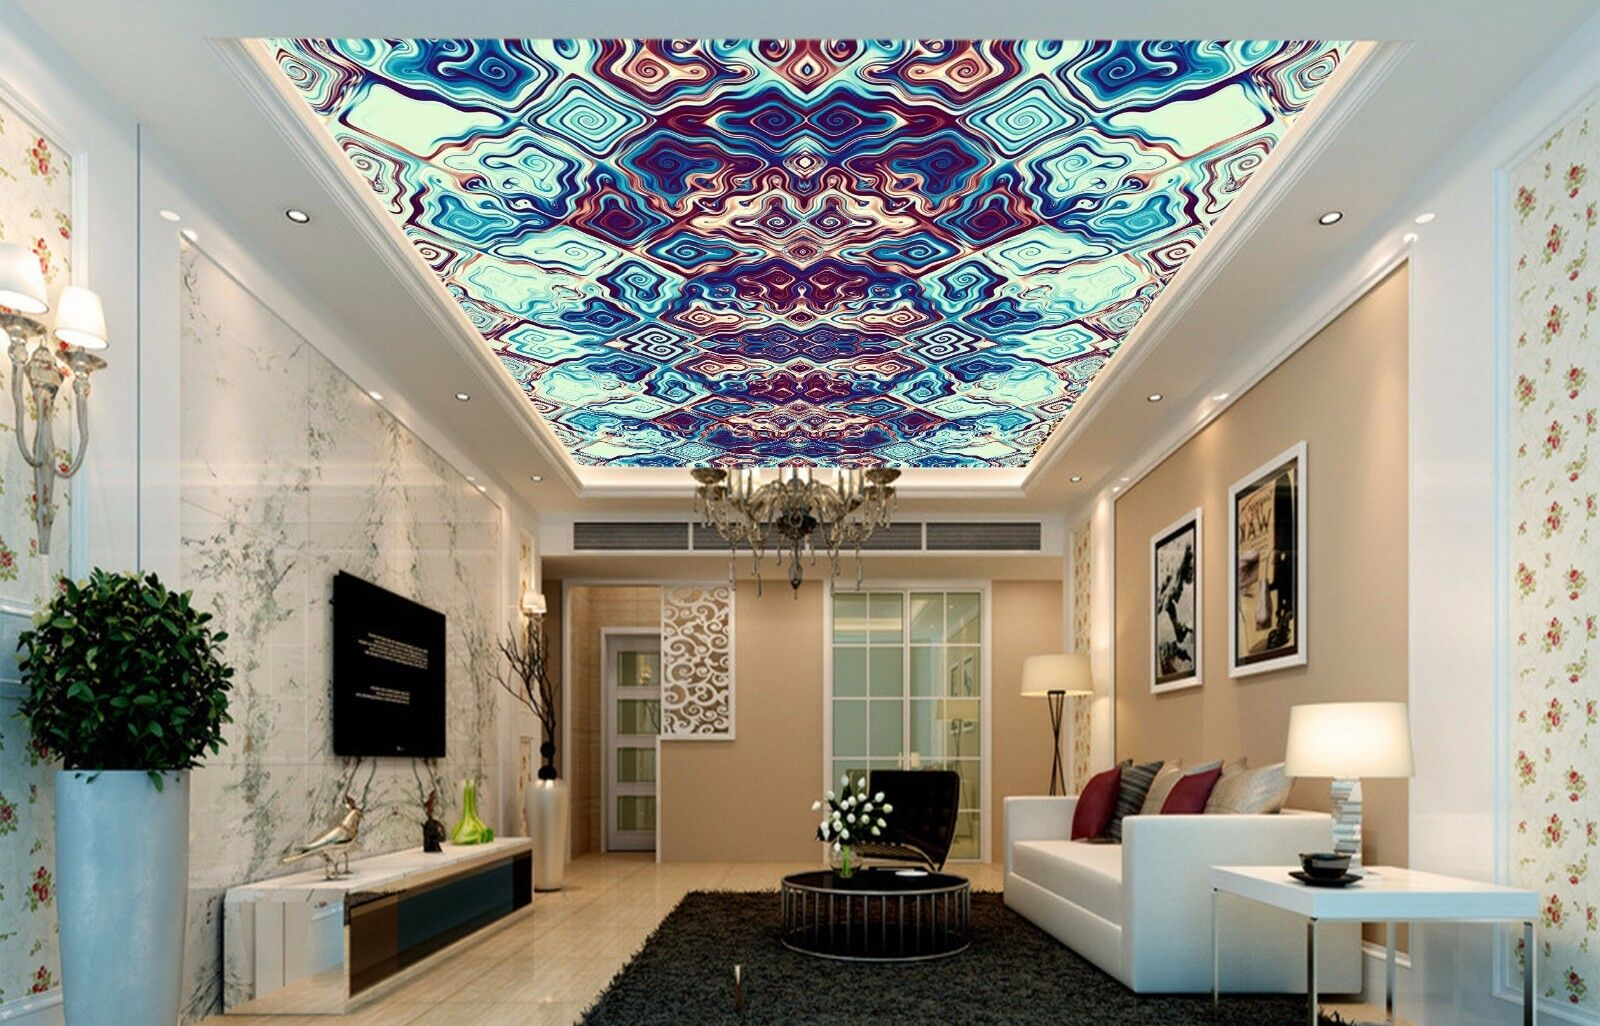 3D Diamond Ceiling WallPaper Murals Wall Print Decal AJ WALLPAPER US